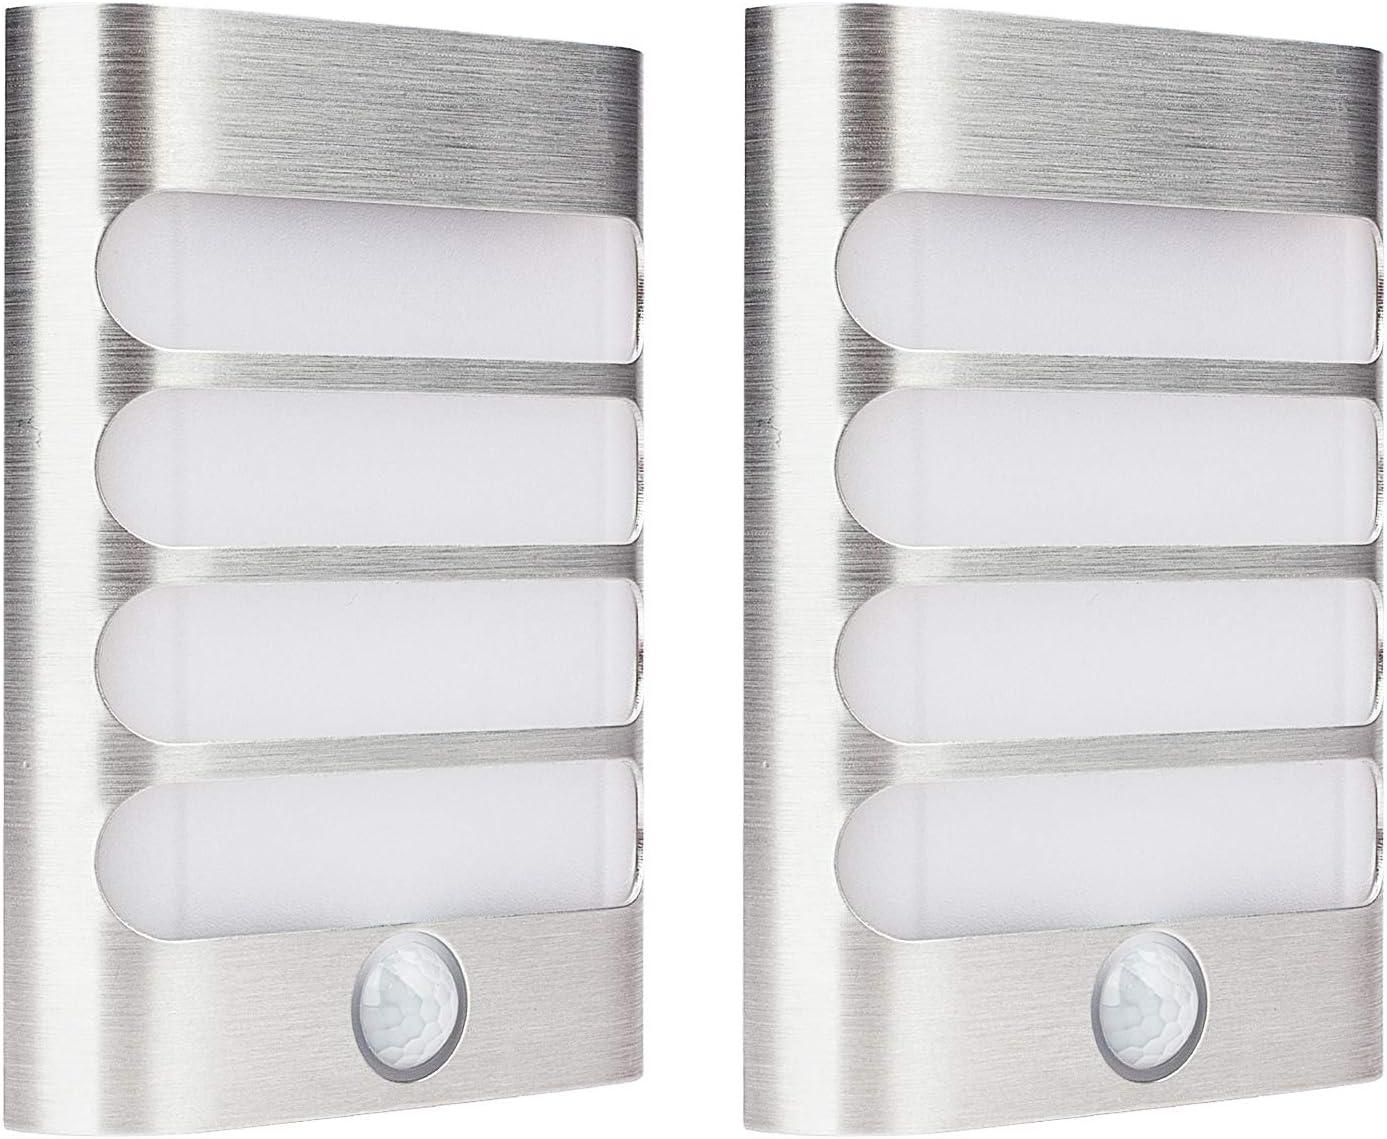 2-Pack Leadleds Luxury Aluminum Stick Anywhere Bright Motion Sen